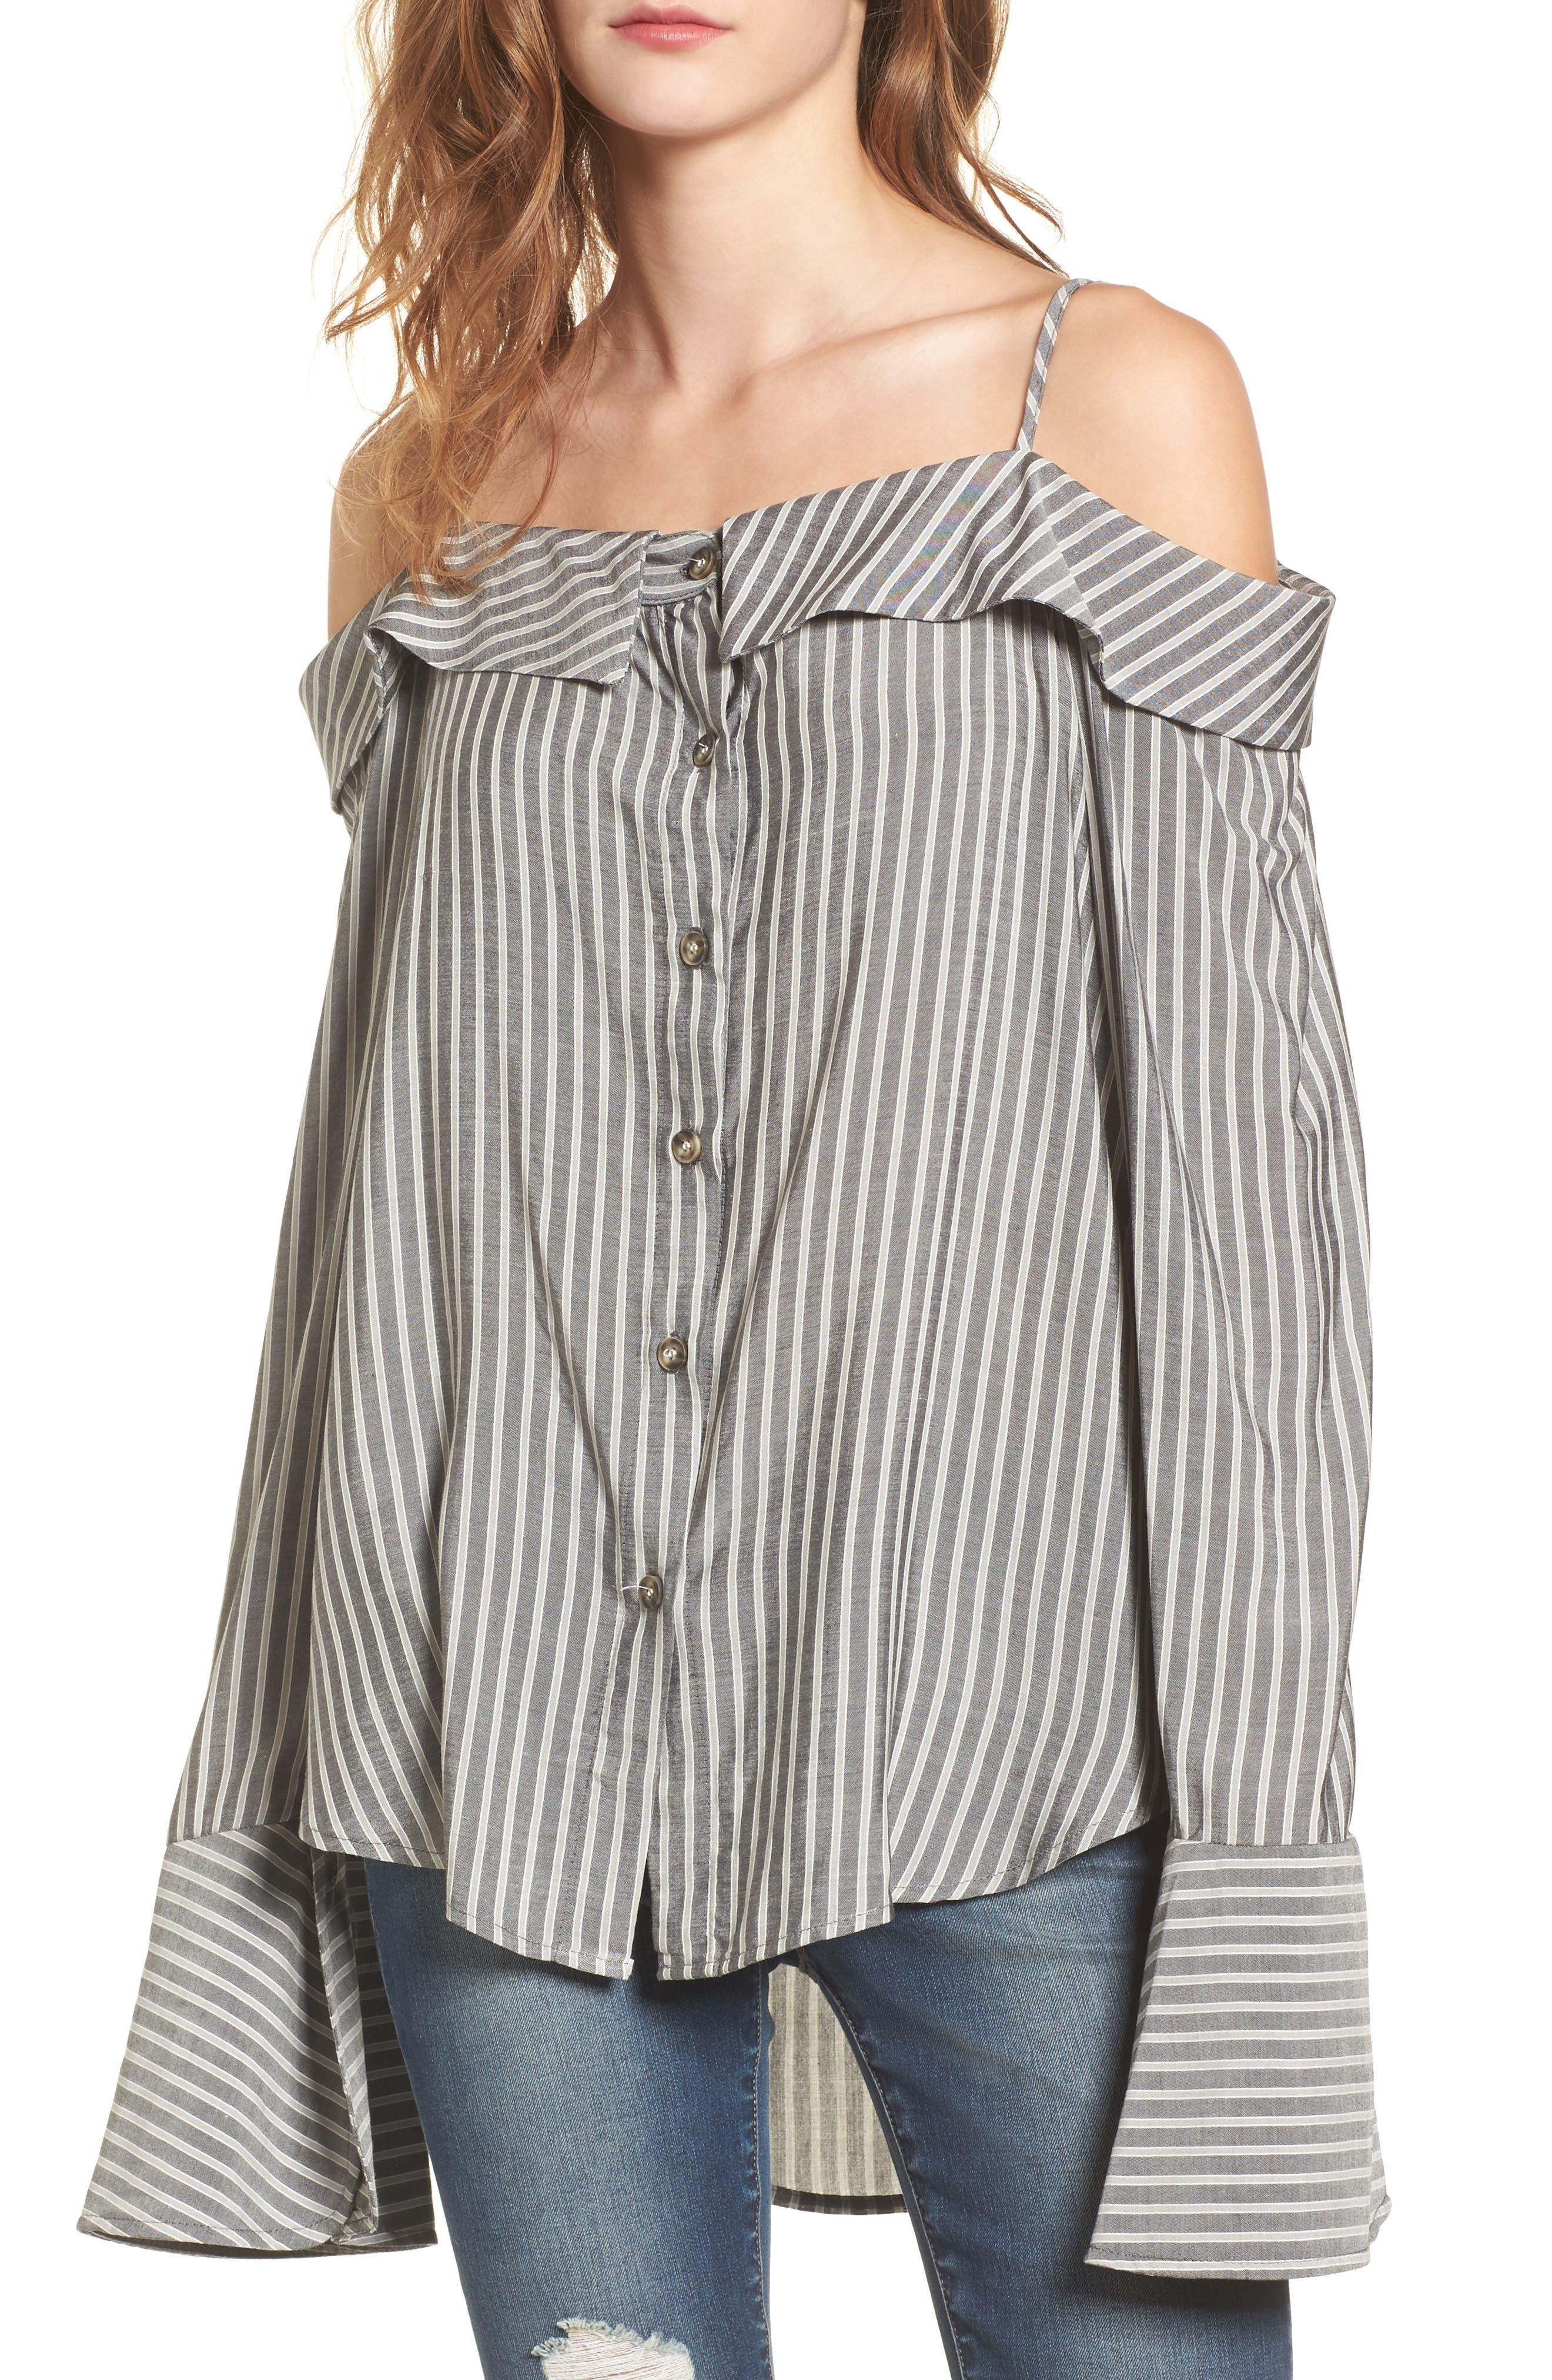 Main Image - Mimi Chica Flare Cuff Cold Shoulder Top